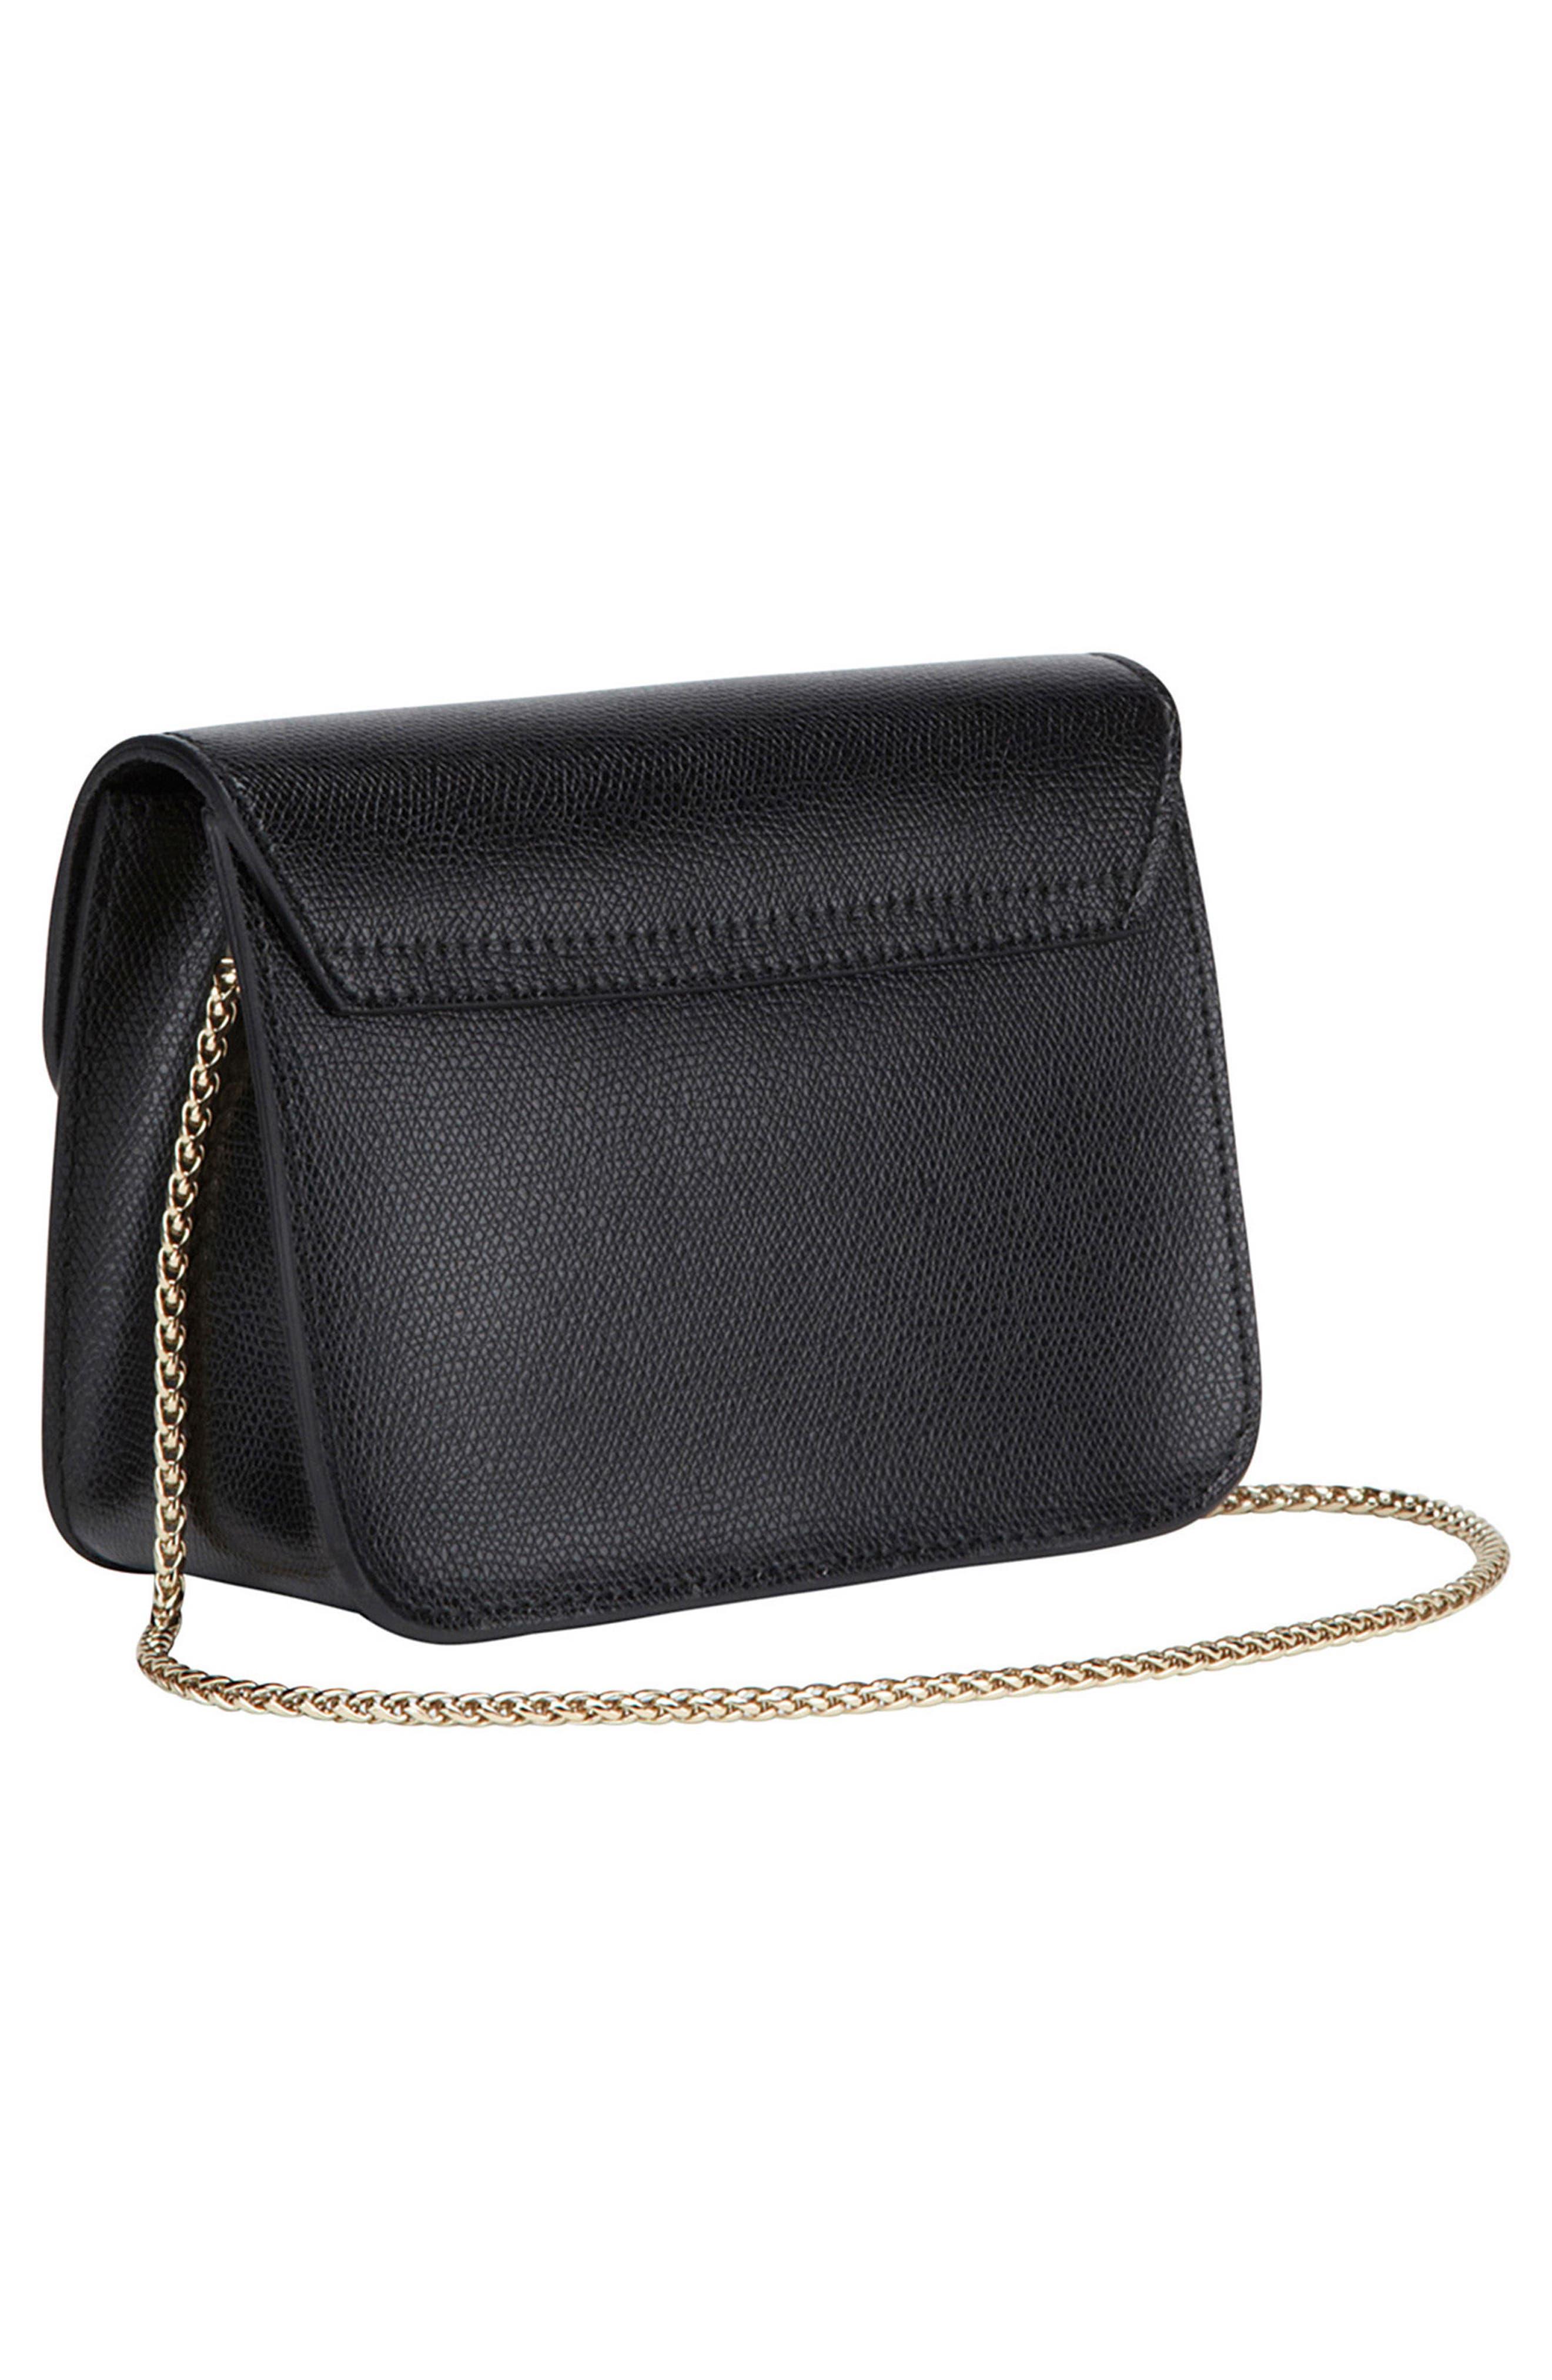 Mini Metropolis Leather Crossbody Bag,                             Alternate thumbnail 3, color,                             004